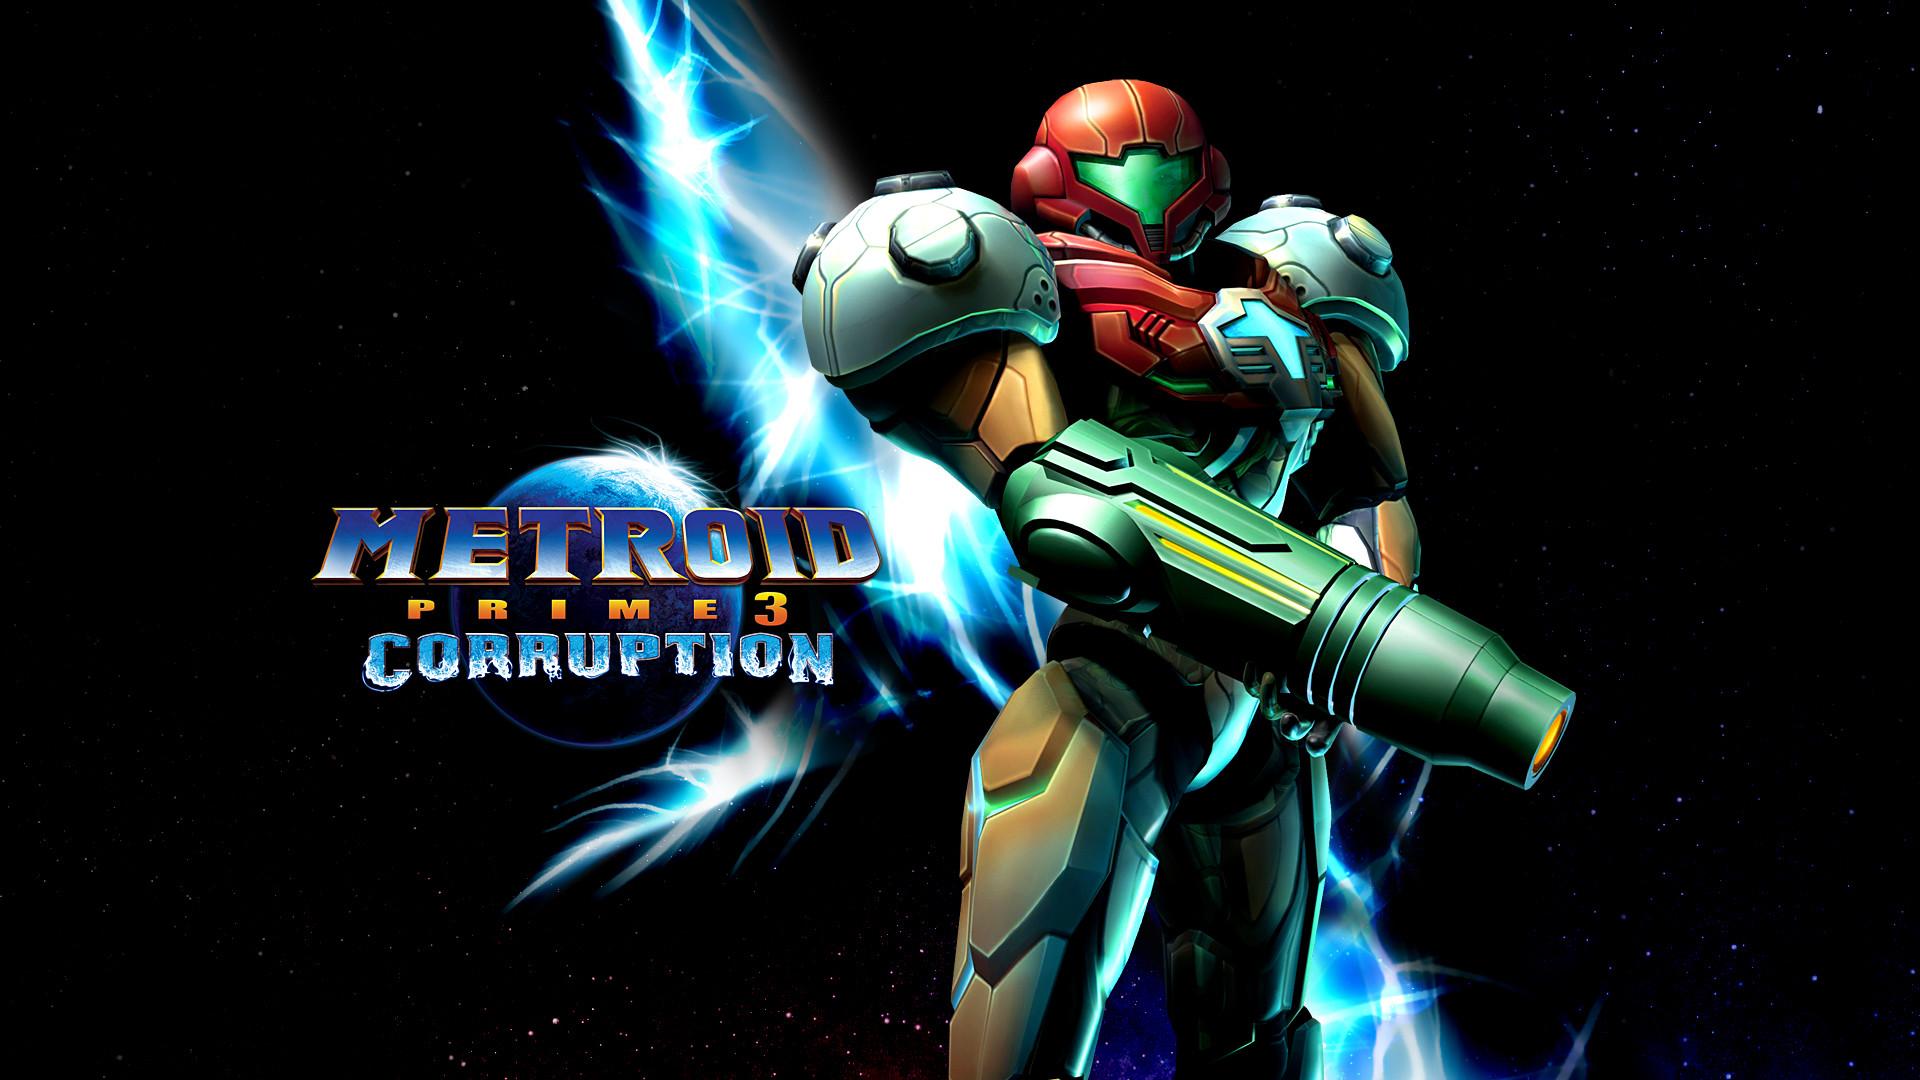 Video Game – Metroid Prime 3: Corruption Wallpaper